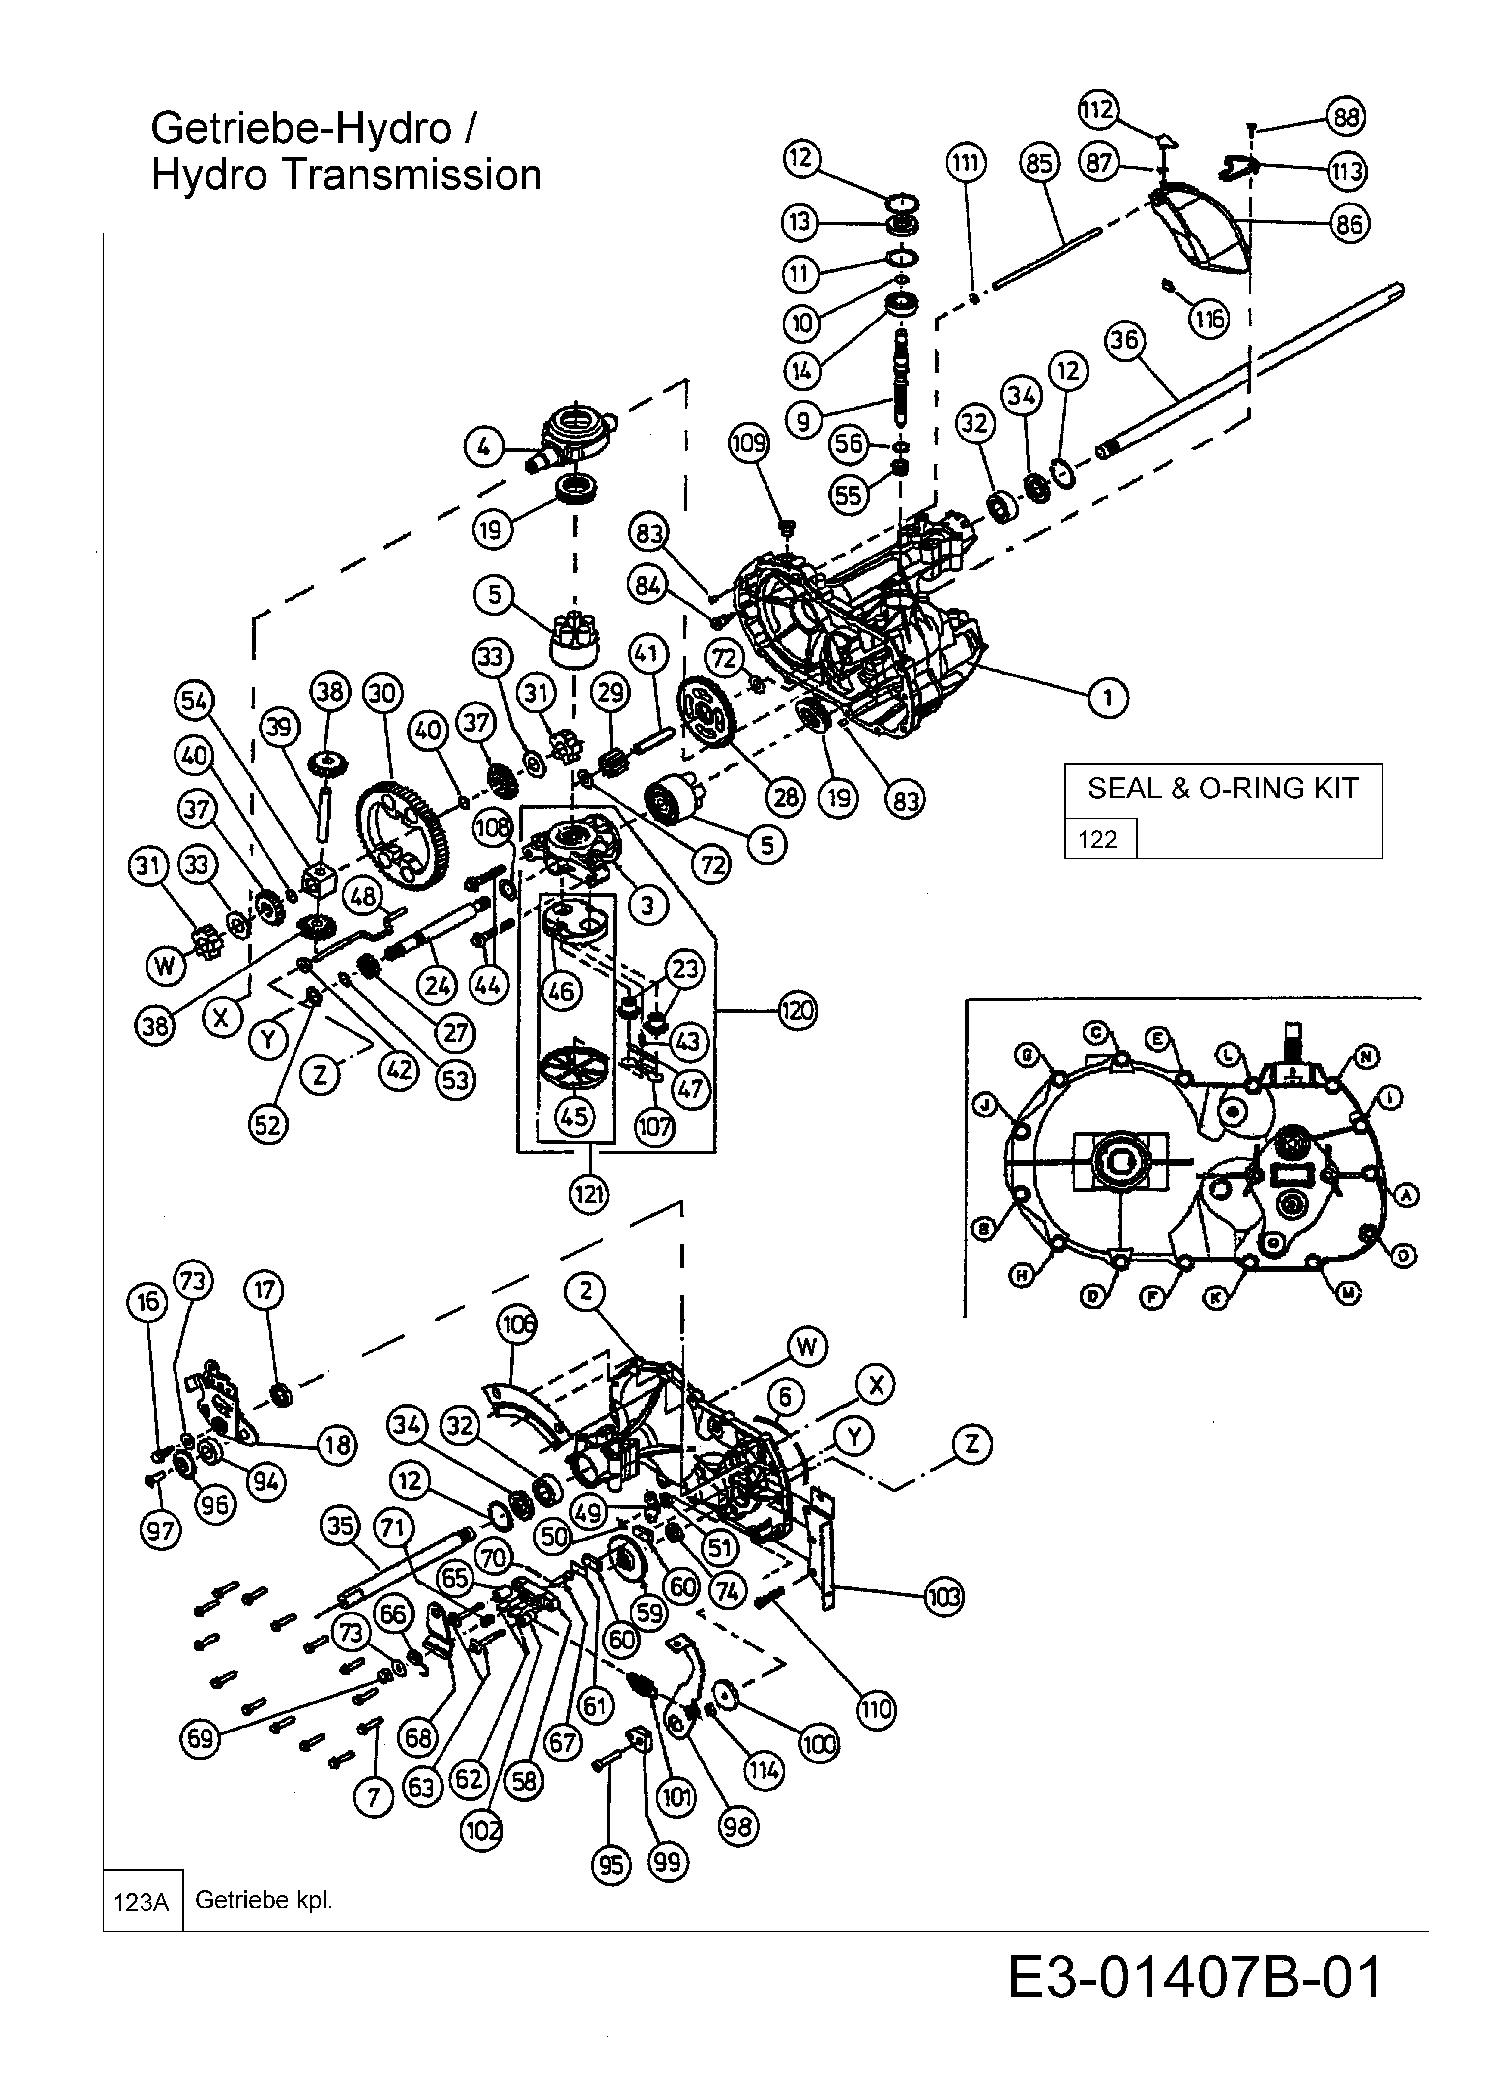 Hydrostat 13bi516e690 2003 Glx 92 Rhlk Rasentraktoren Gutbrod